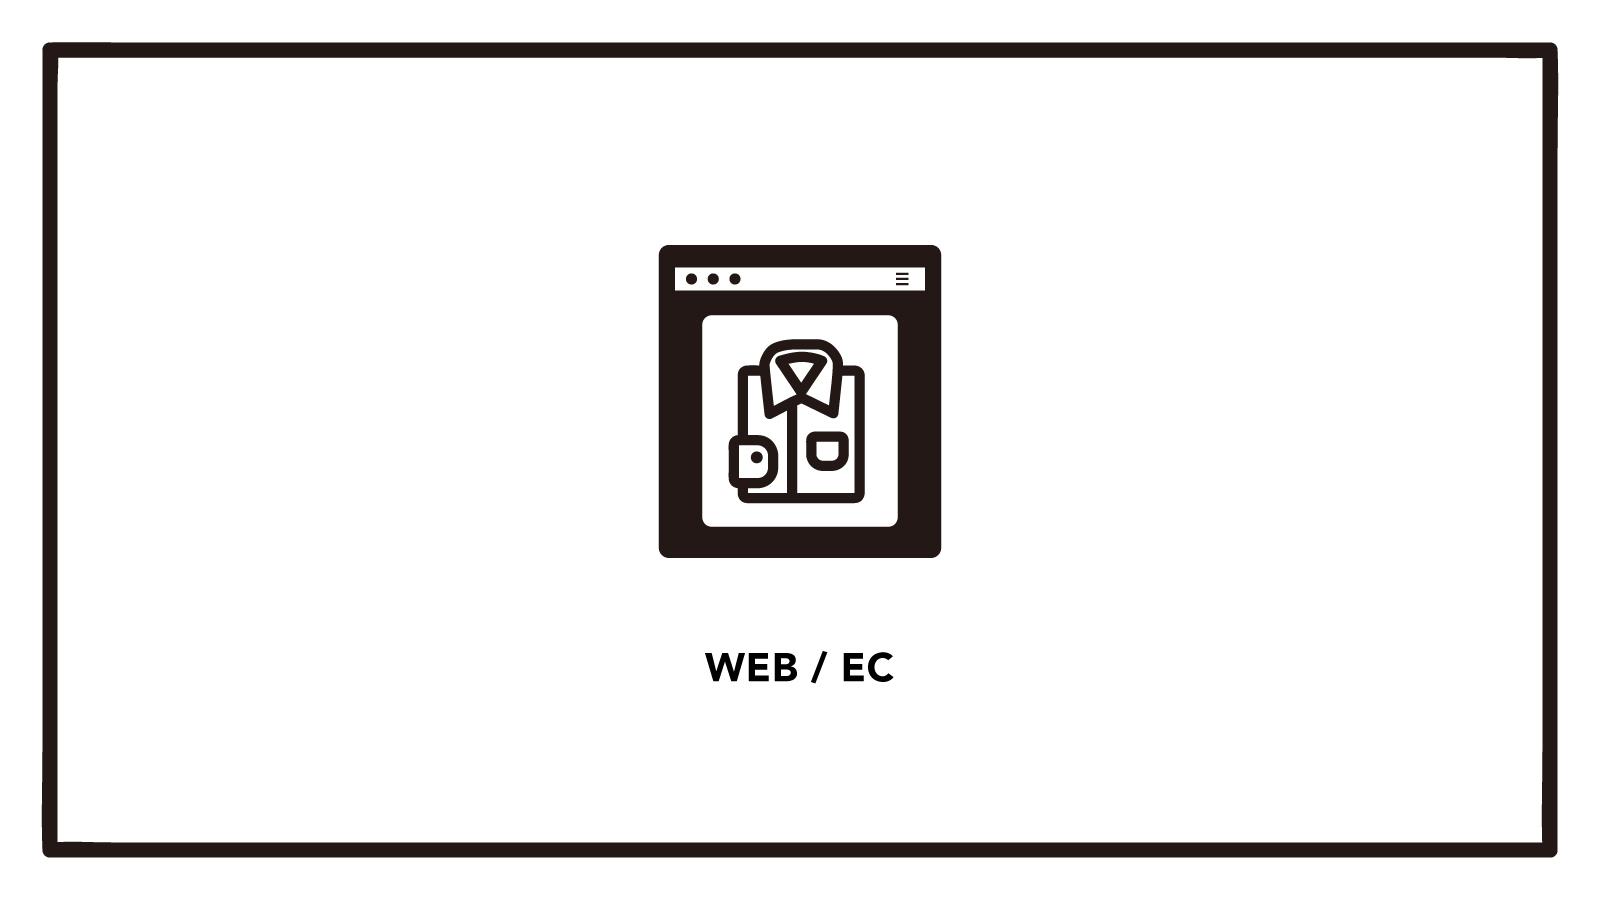 WEBデザイナー|ファッション・アパレル業界最大級の自社ECサイトのカバー写真